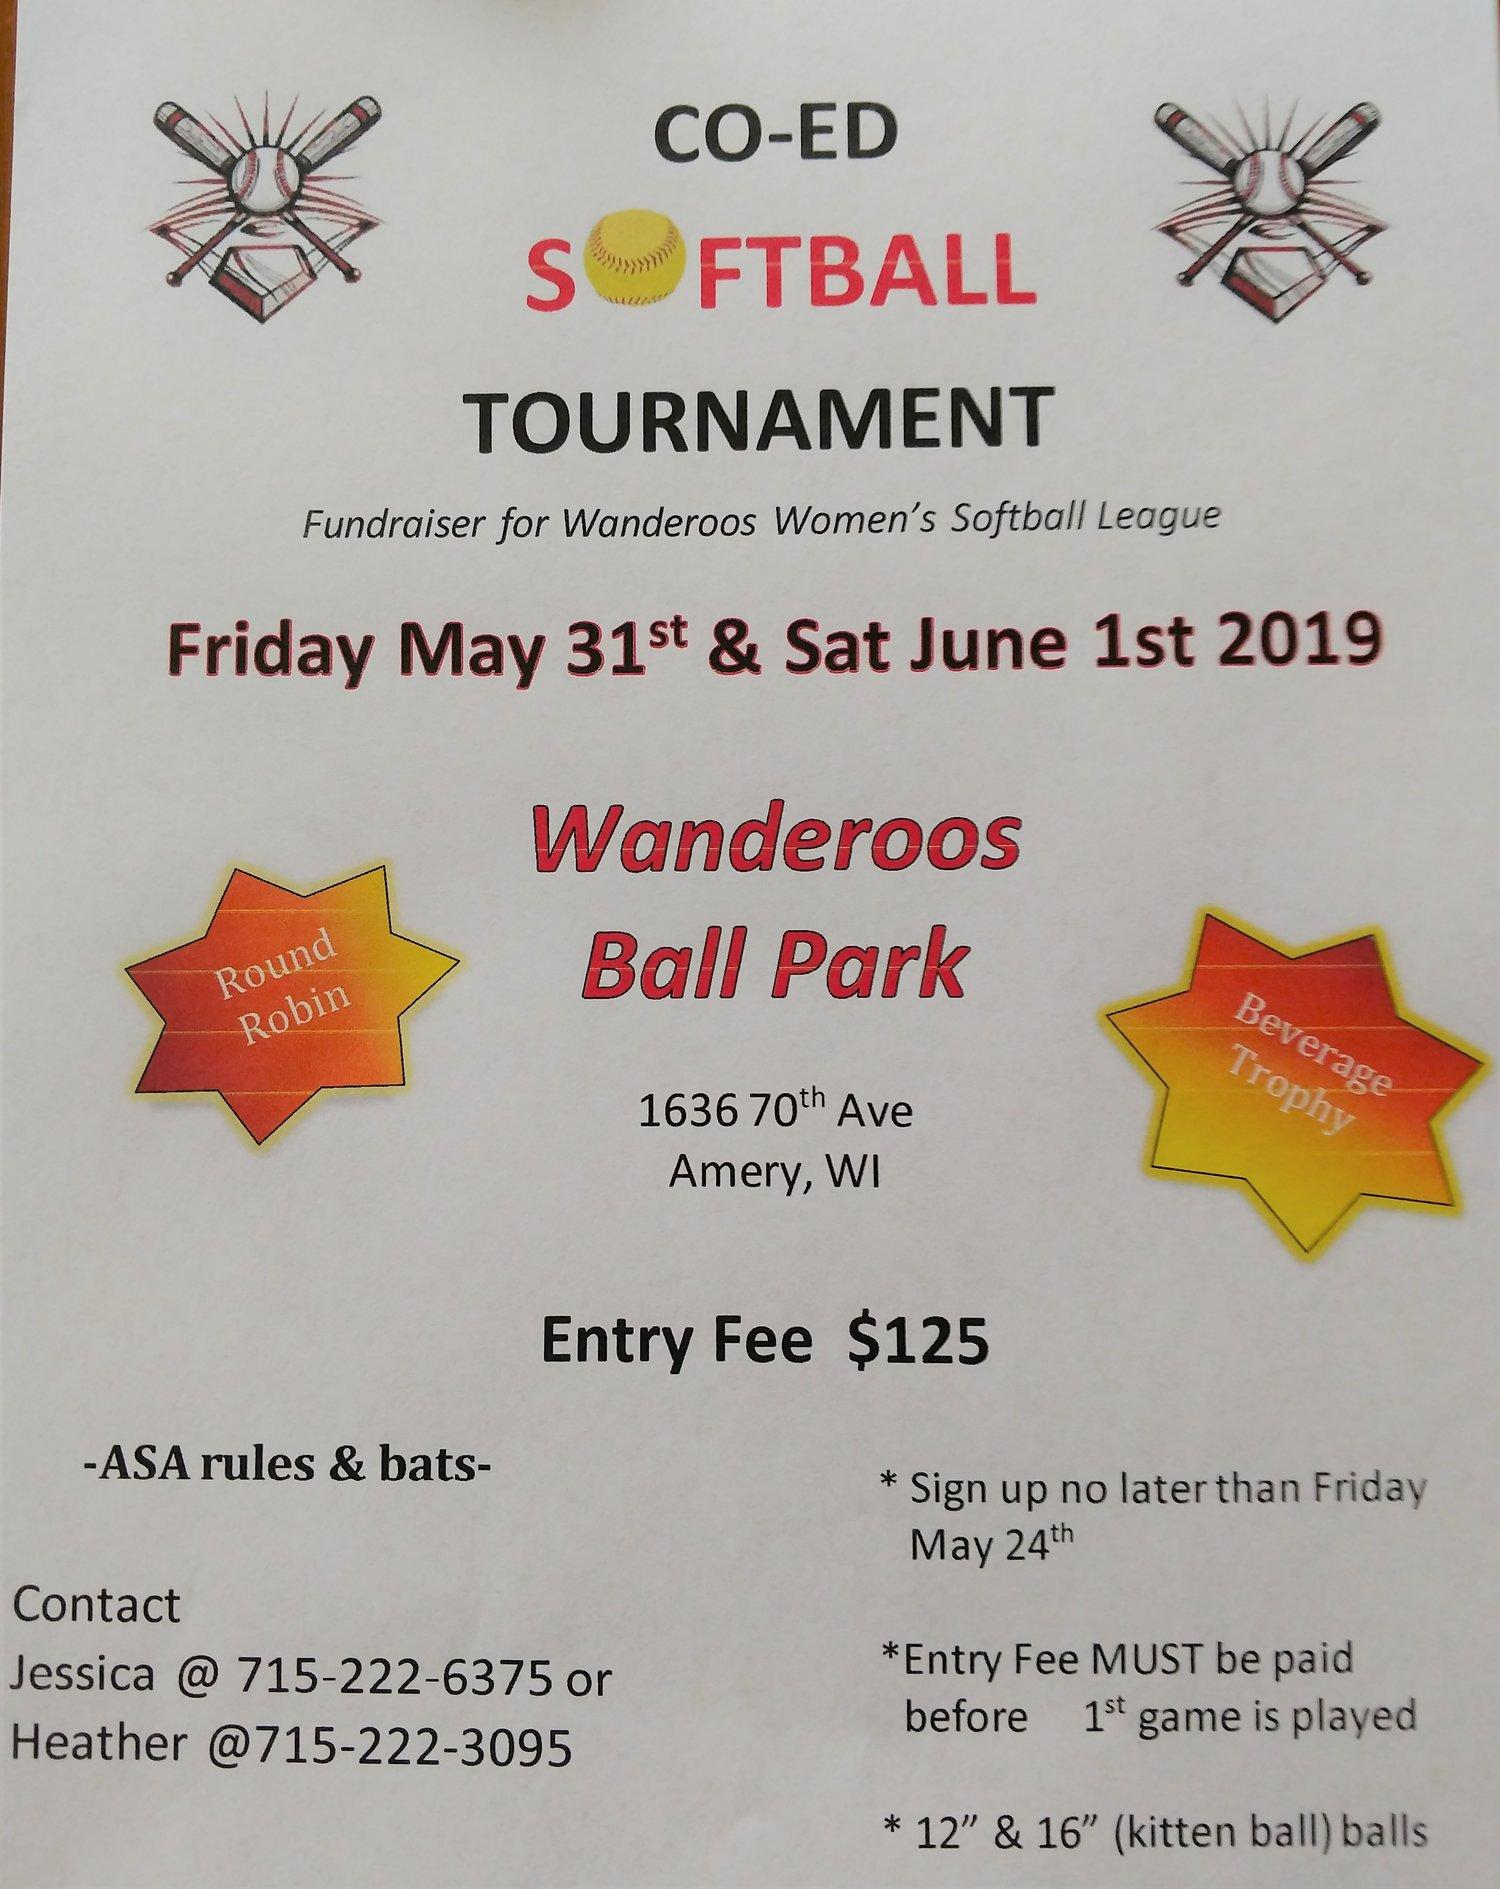 Co-Ed Softball Tournament — Wanderoos, Wisconsin